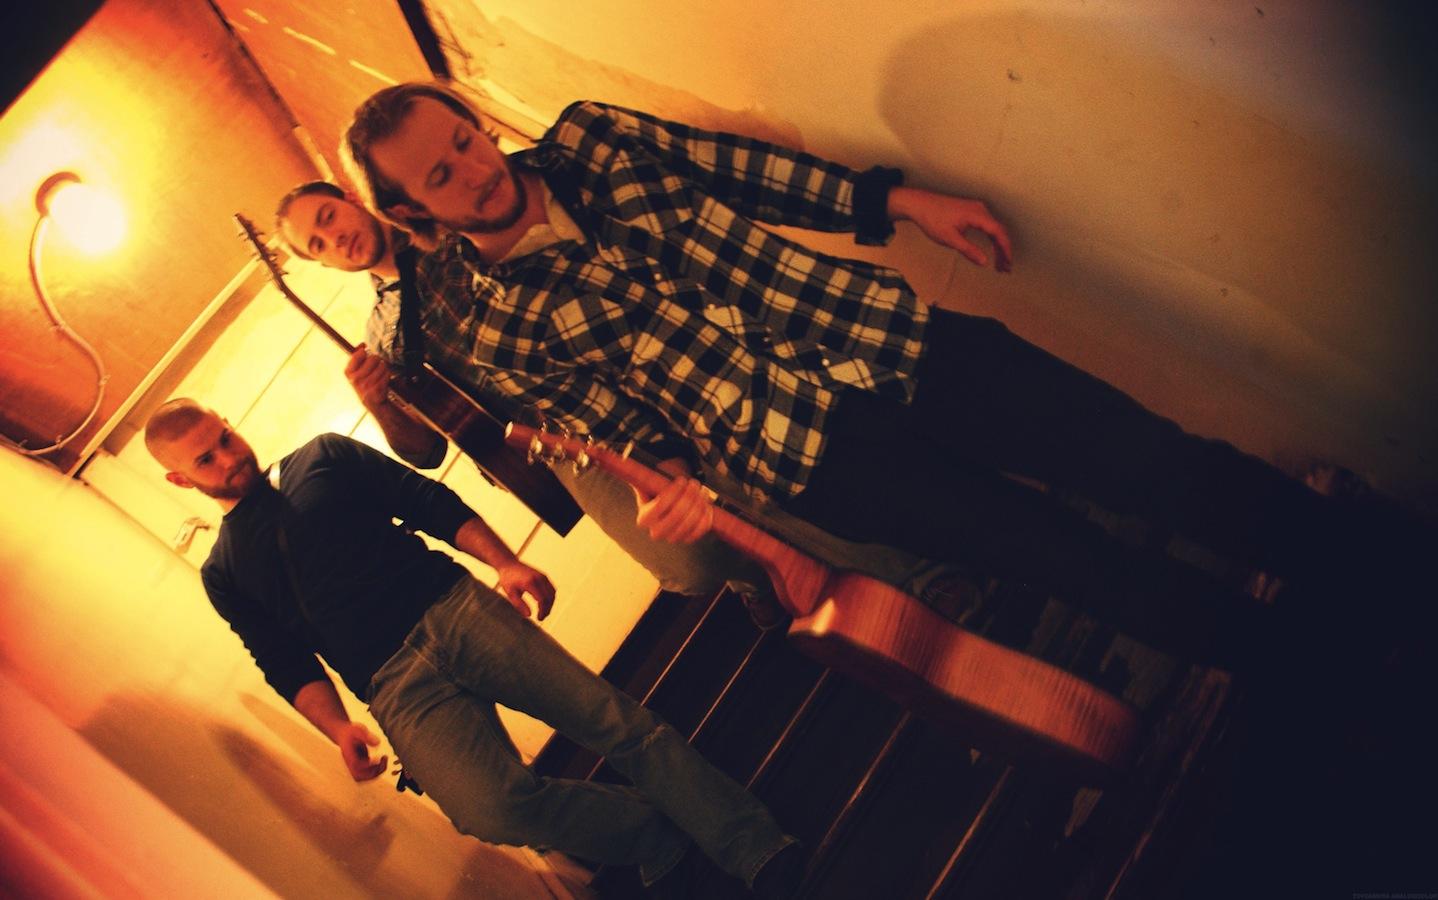 barren-river-trio-american-folk-album-backstage